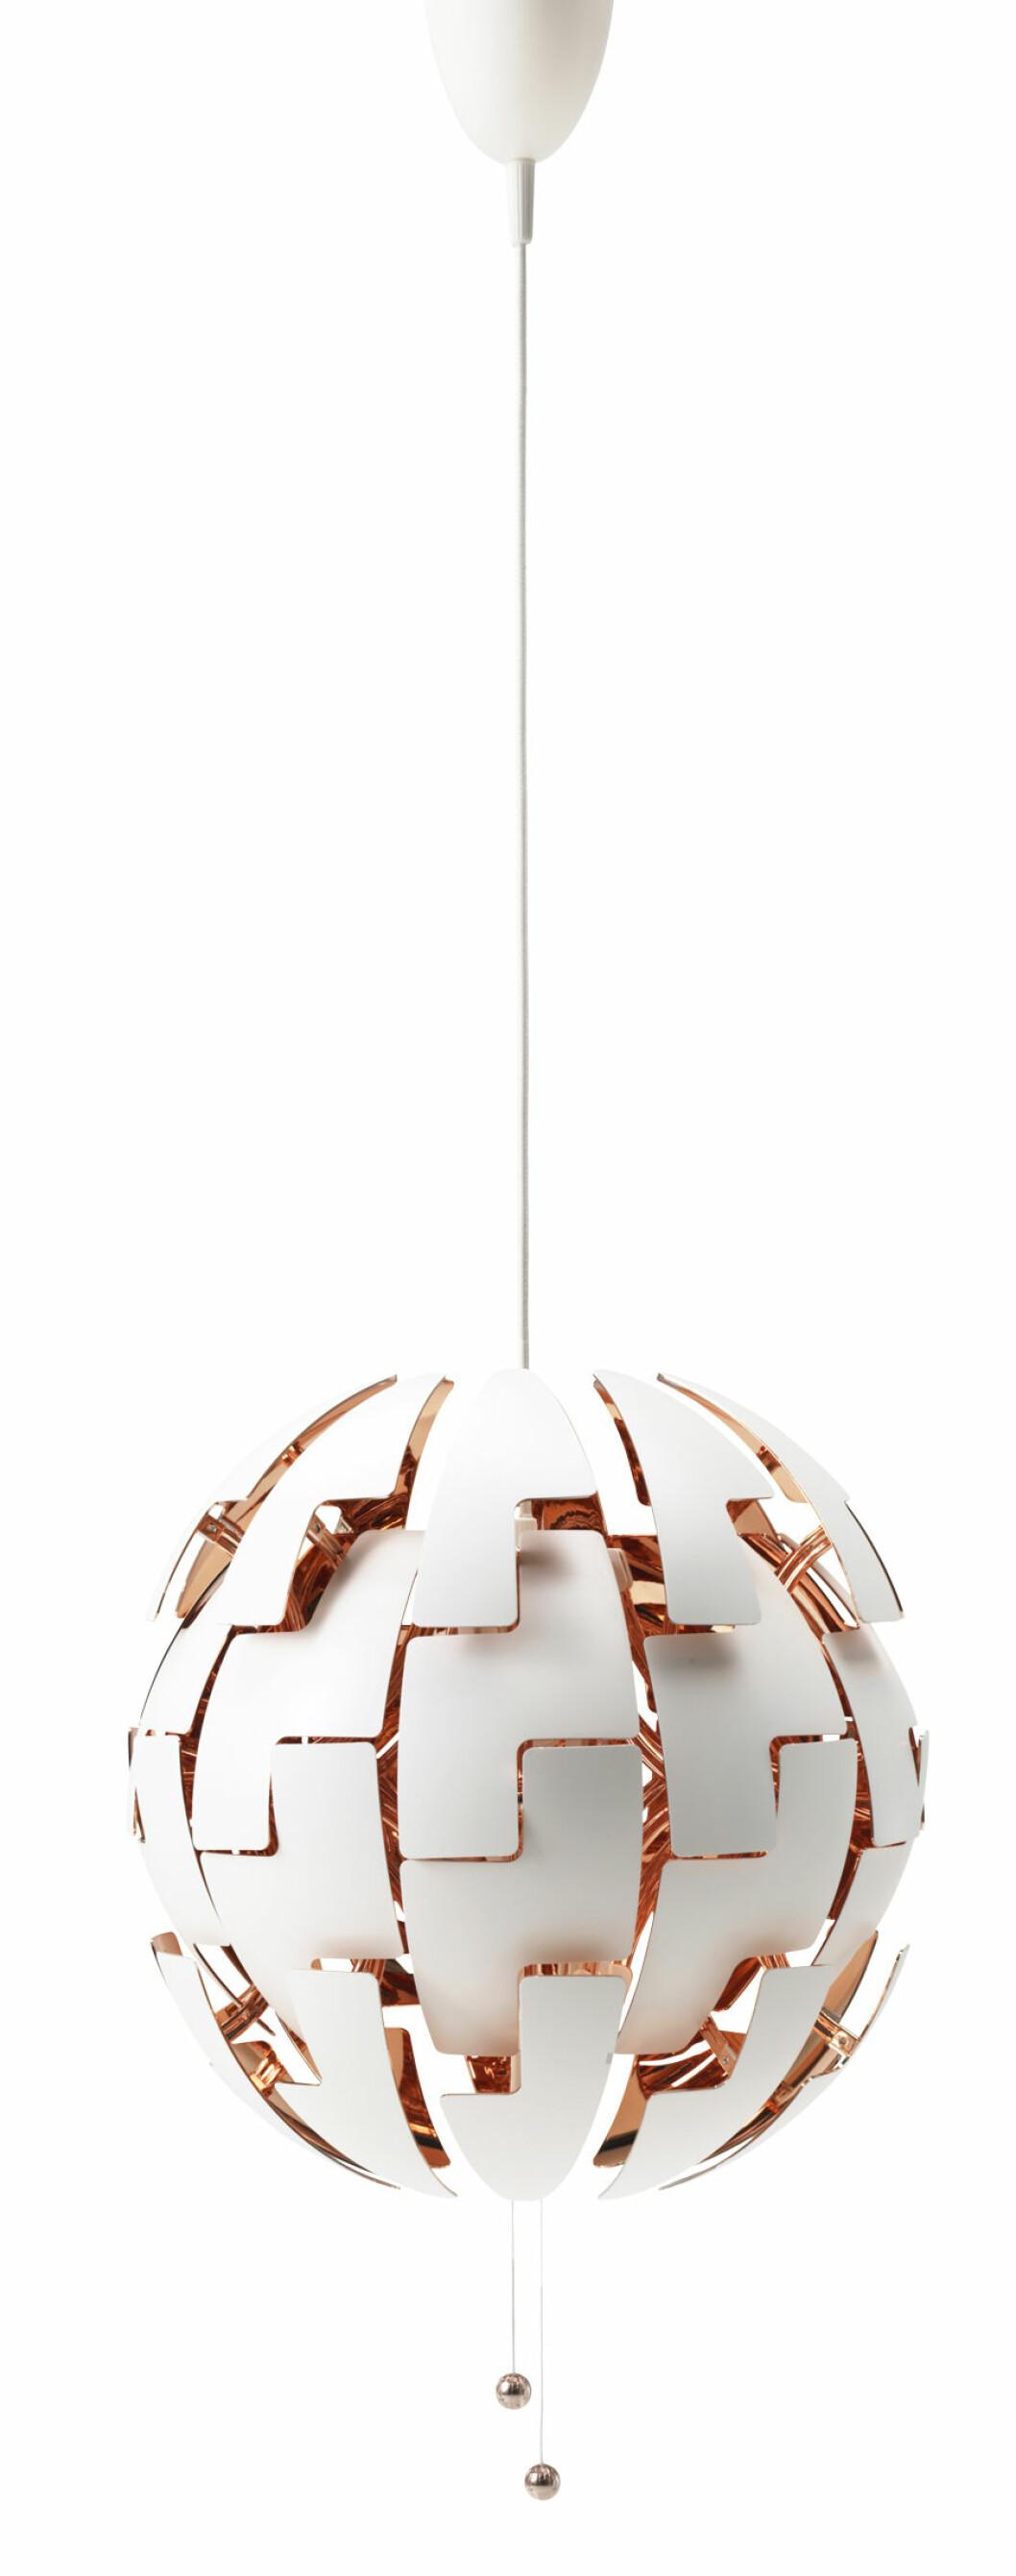 Lampa från Ikea.